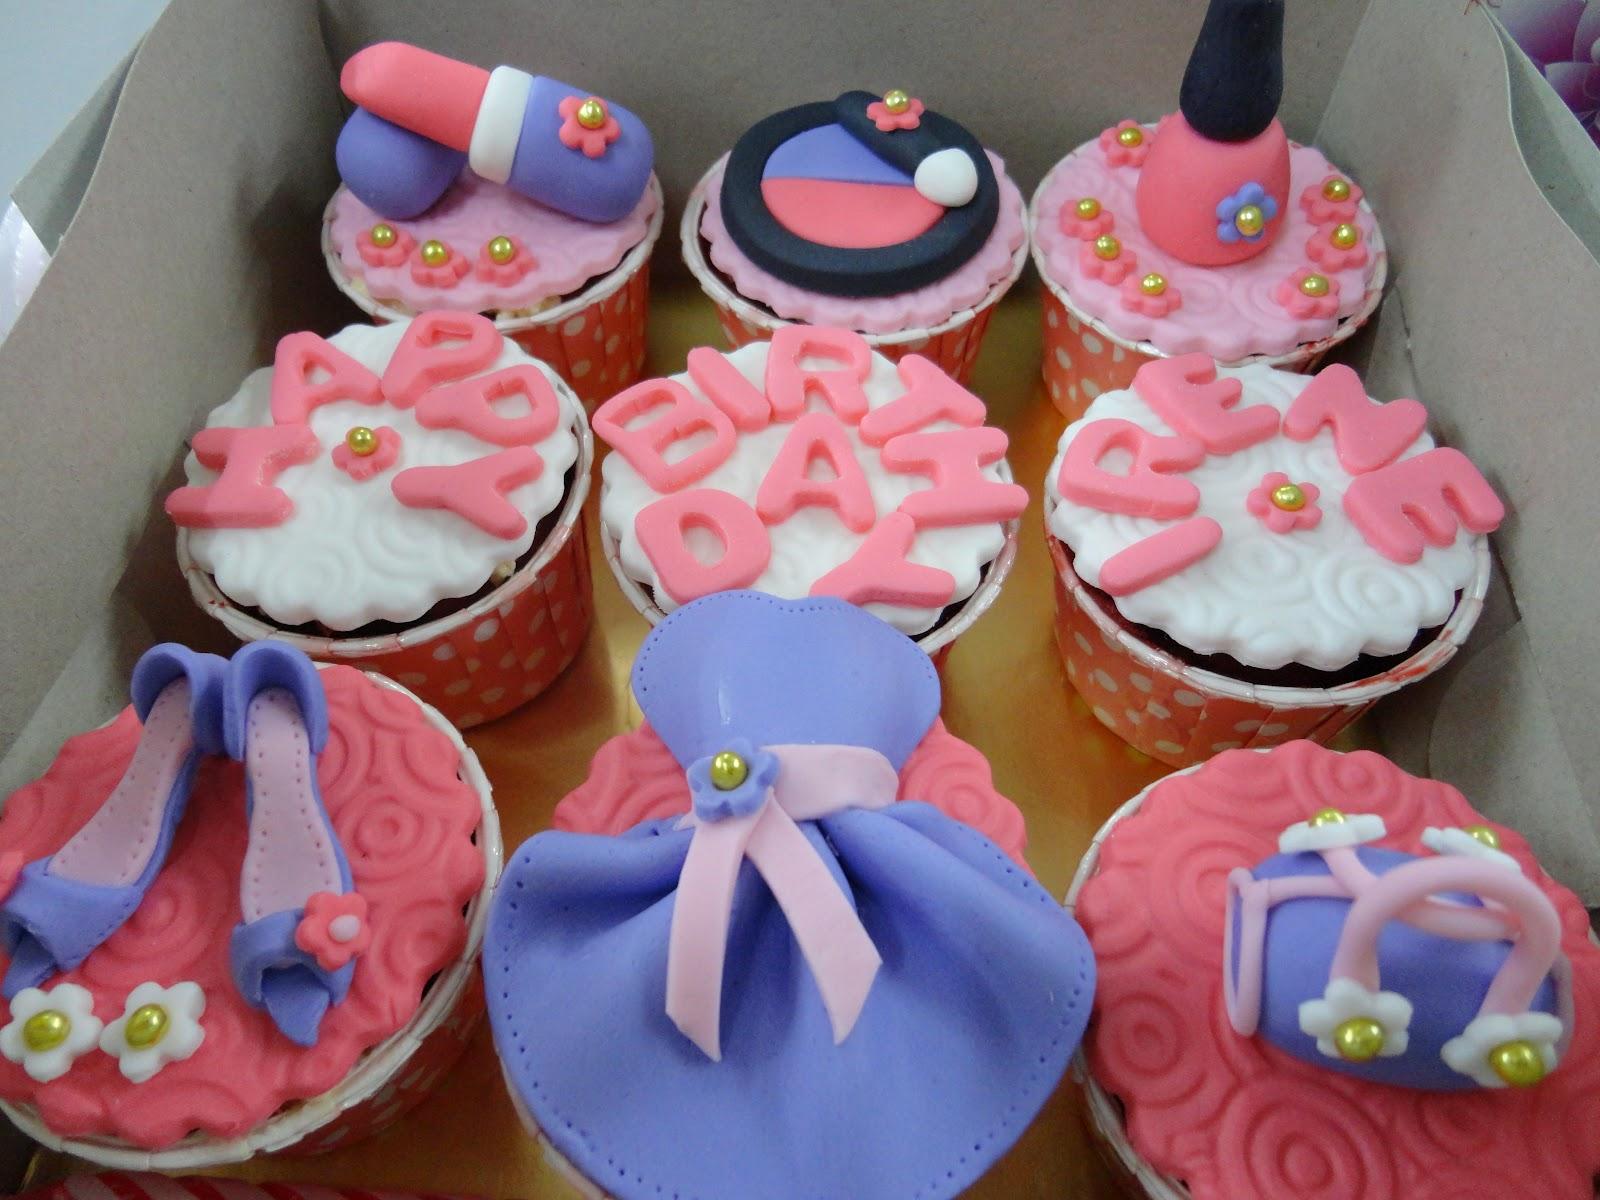 Cupcake Via 8 Year Old Birthday Party Ideas